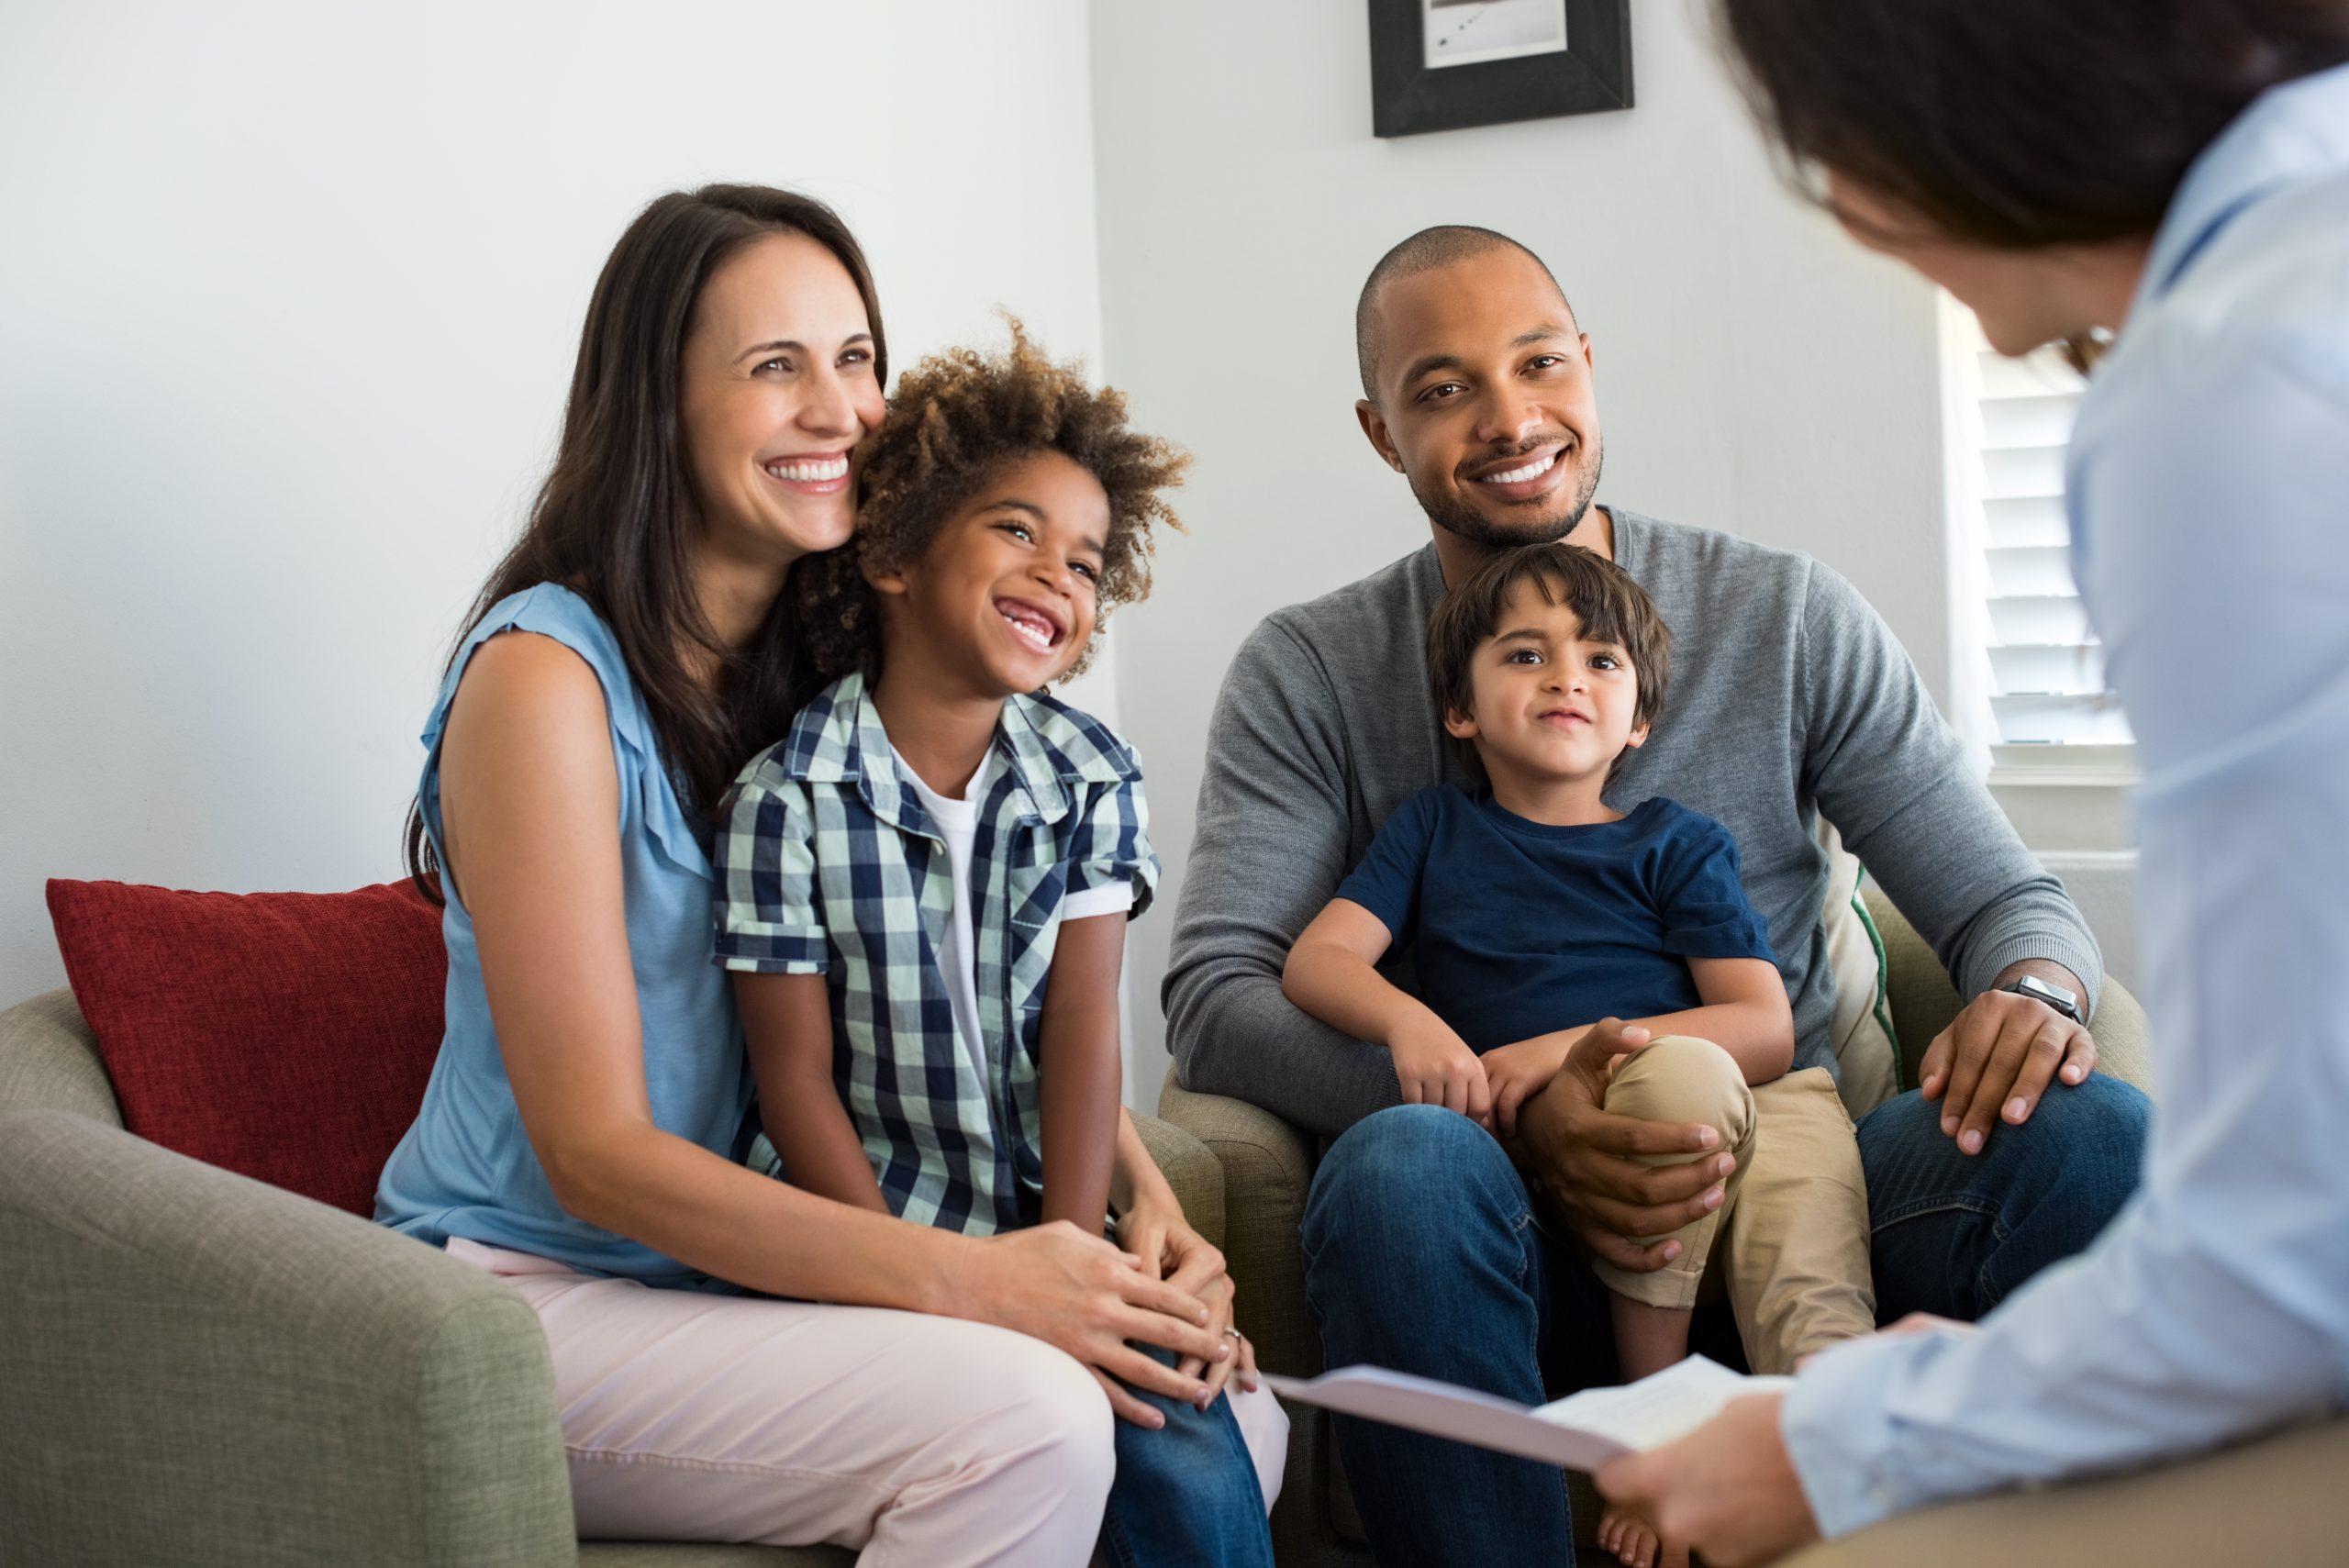 KiFa (Kinder- und Familienbildung)